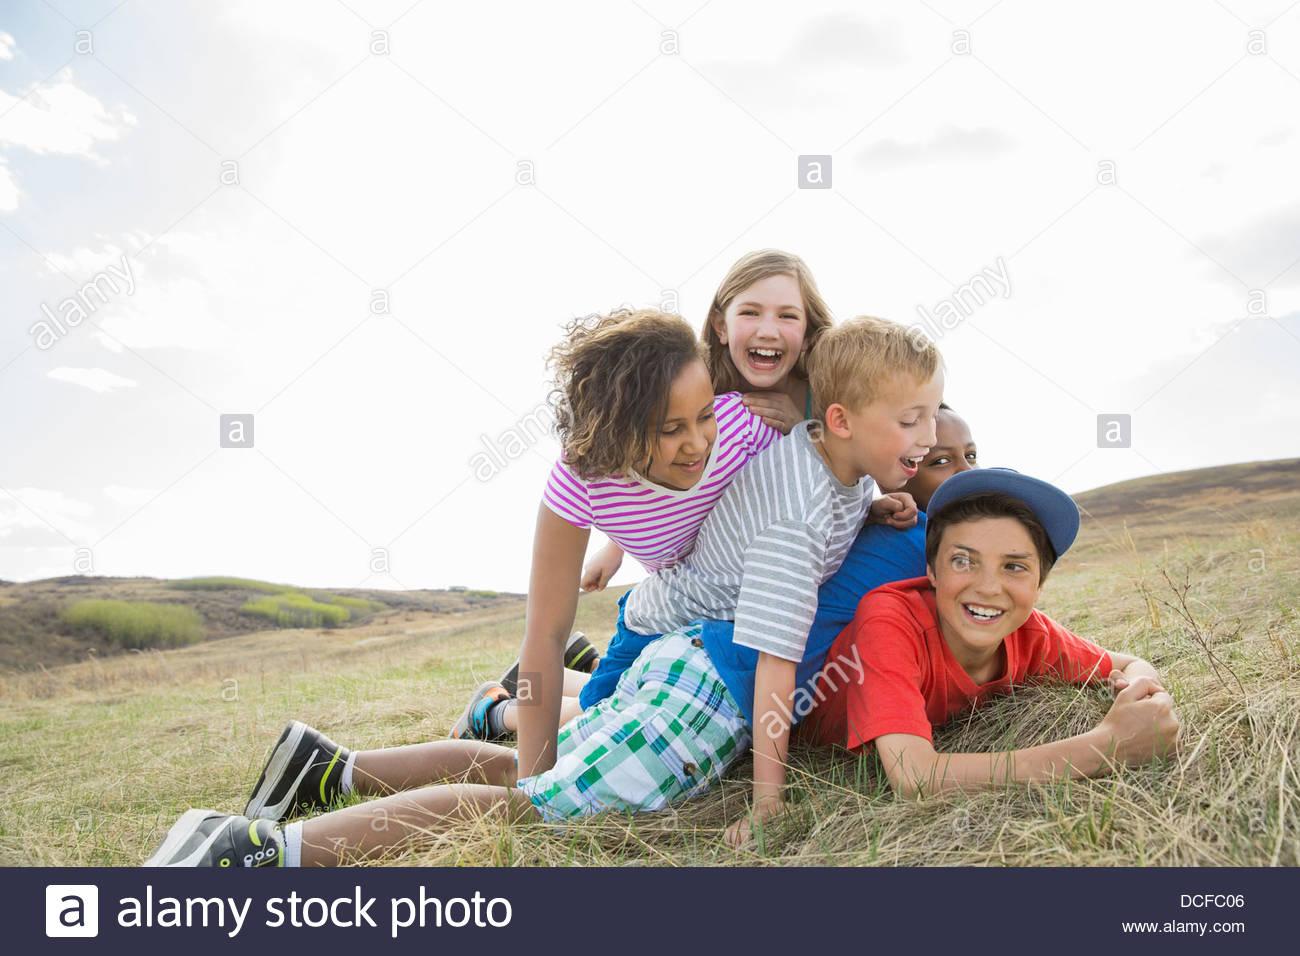 Playful schoolchildren playing outdoors - Stock Image